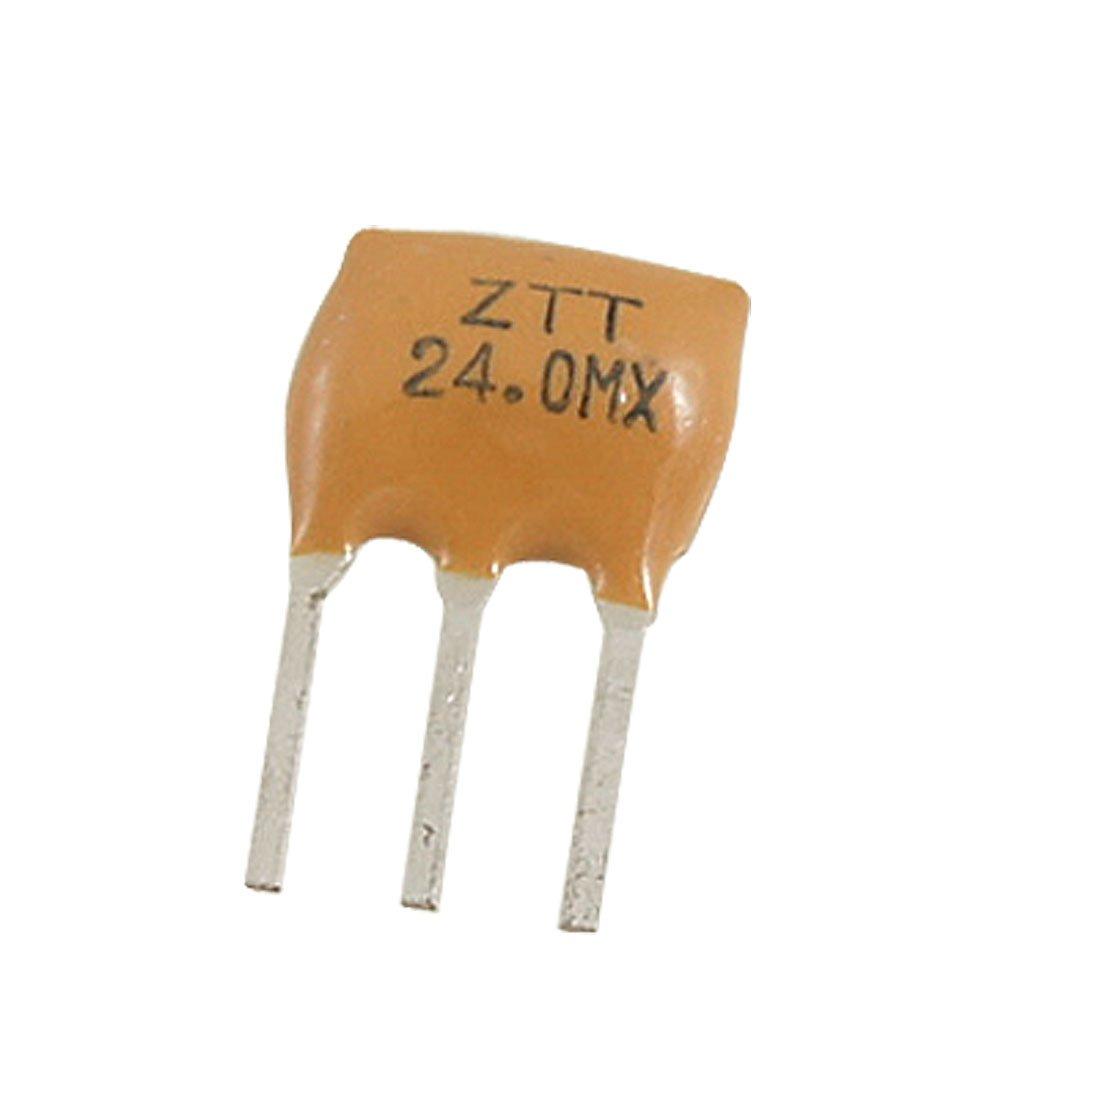 sourcing map 5 Pcs ZTT Series Ceramic Filters Crystal Resonators 3 Pin 24.000MHz